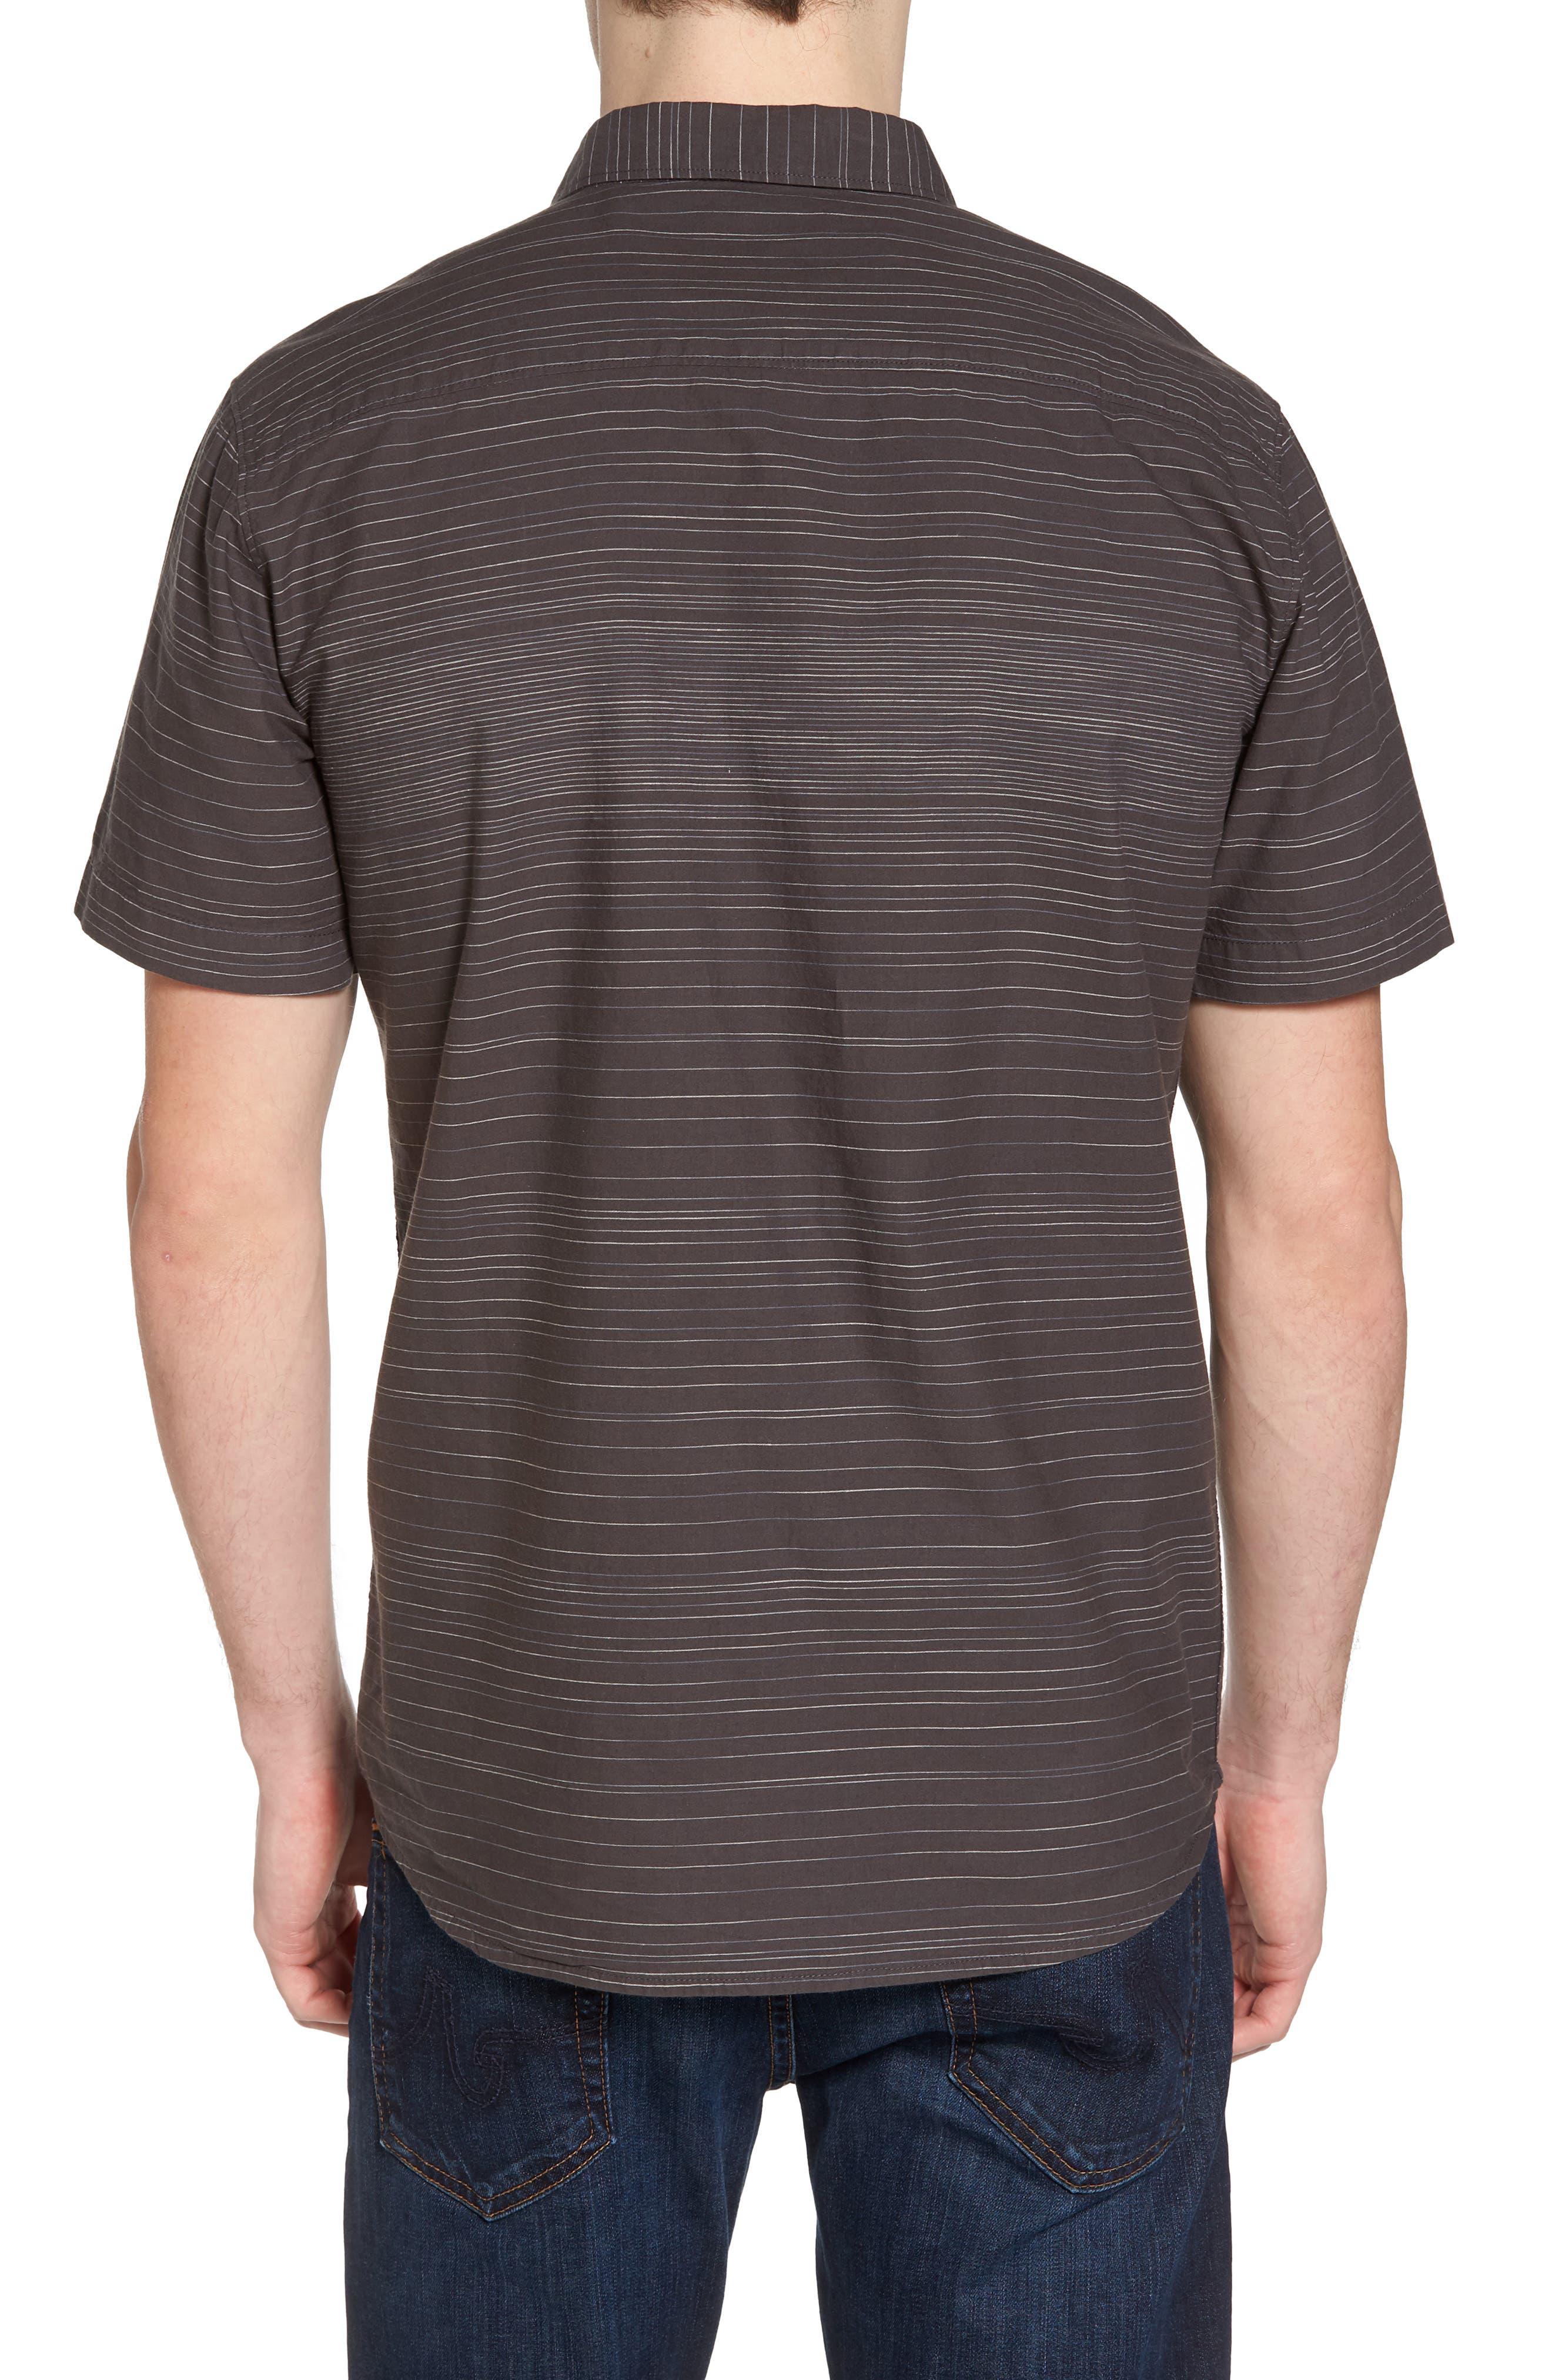 Hound Woven Shirt,                             Alternate thumbnail 2, color,                             020